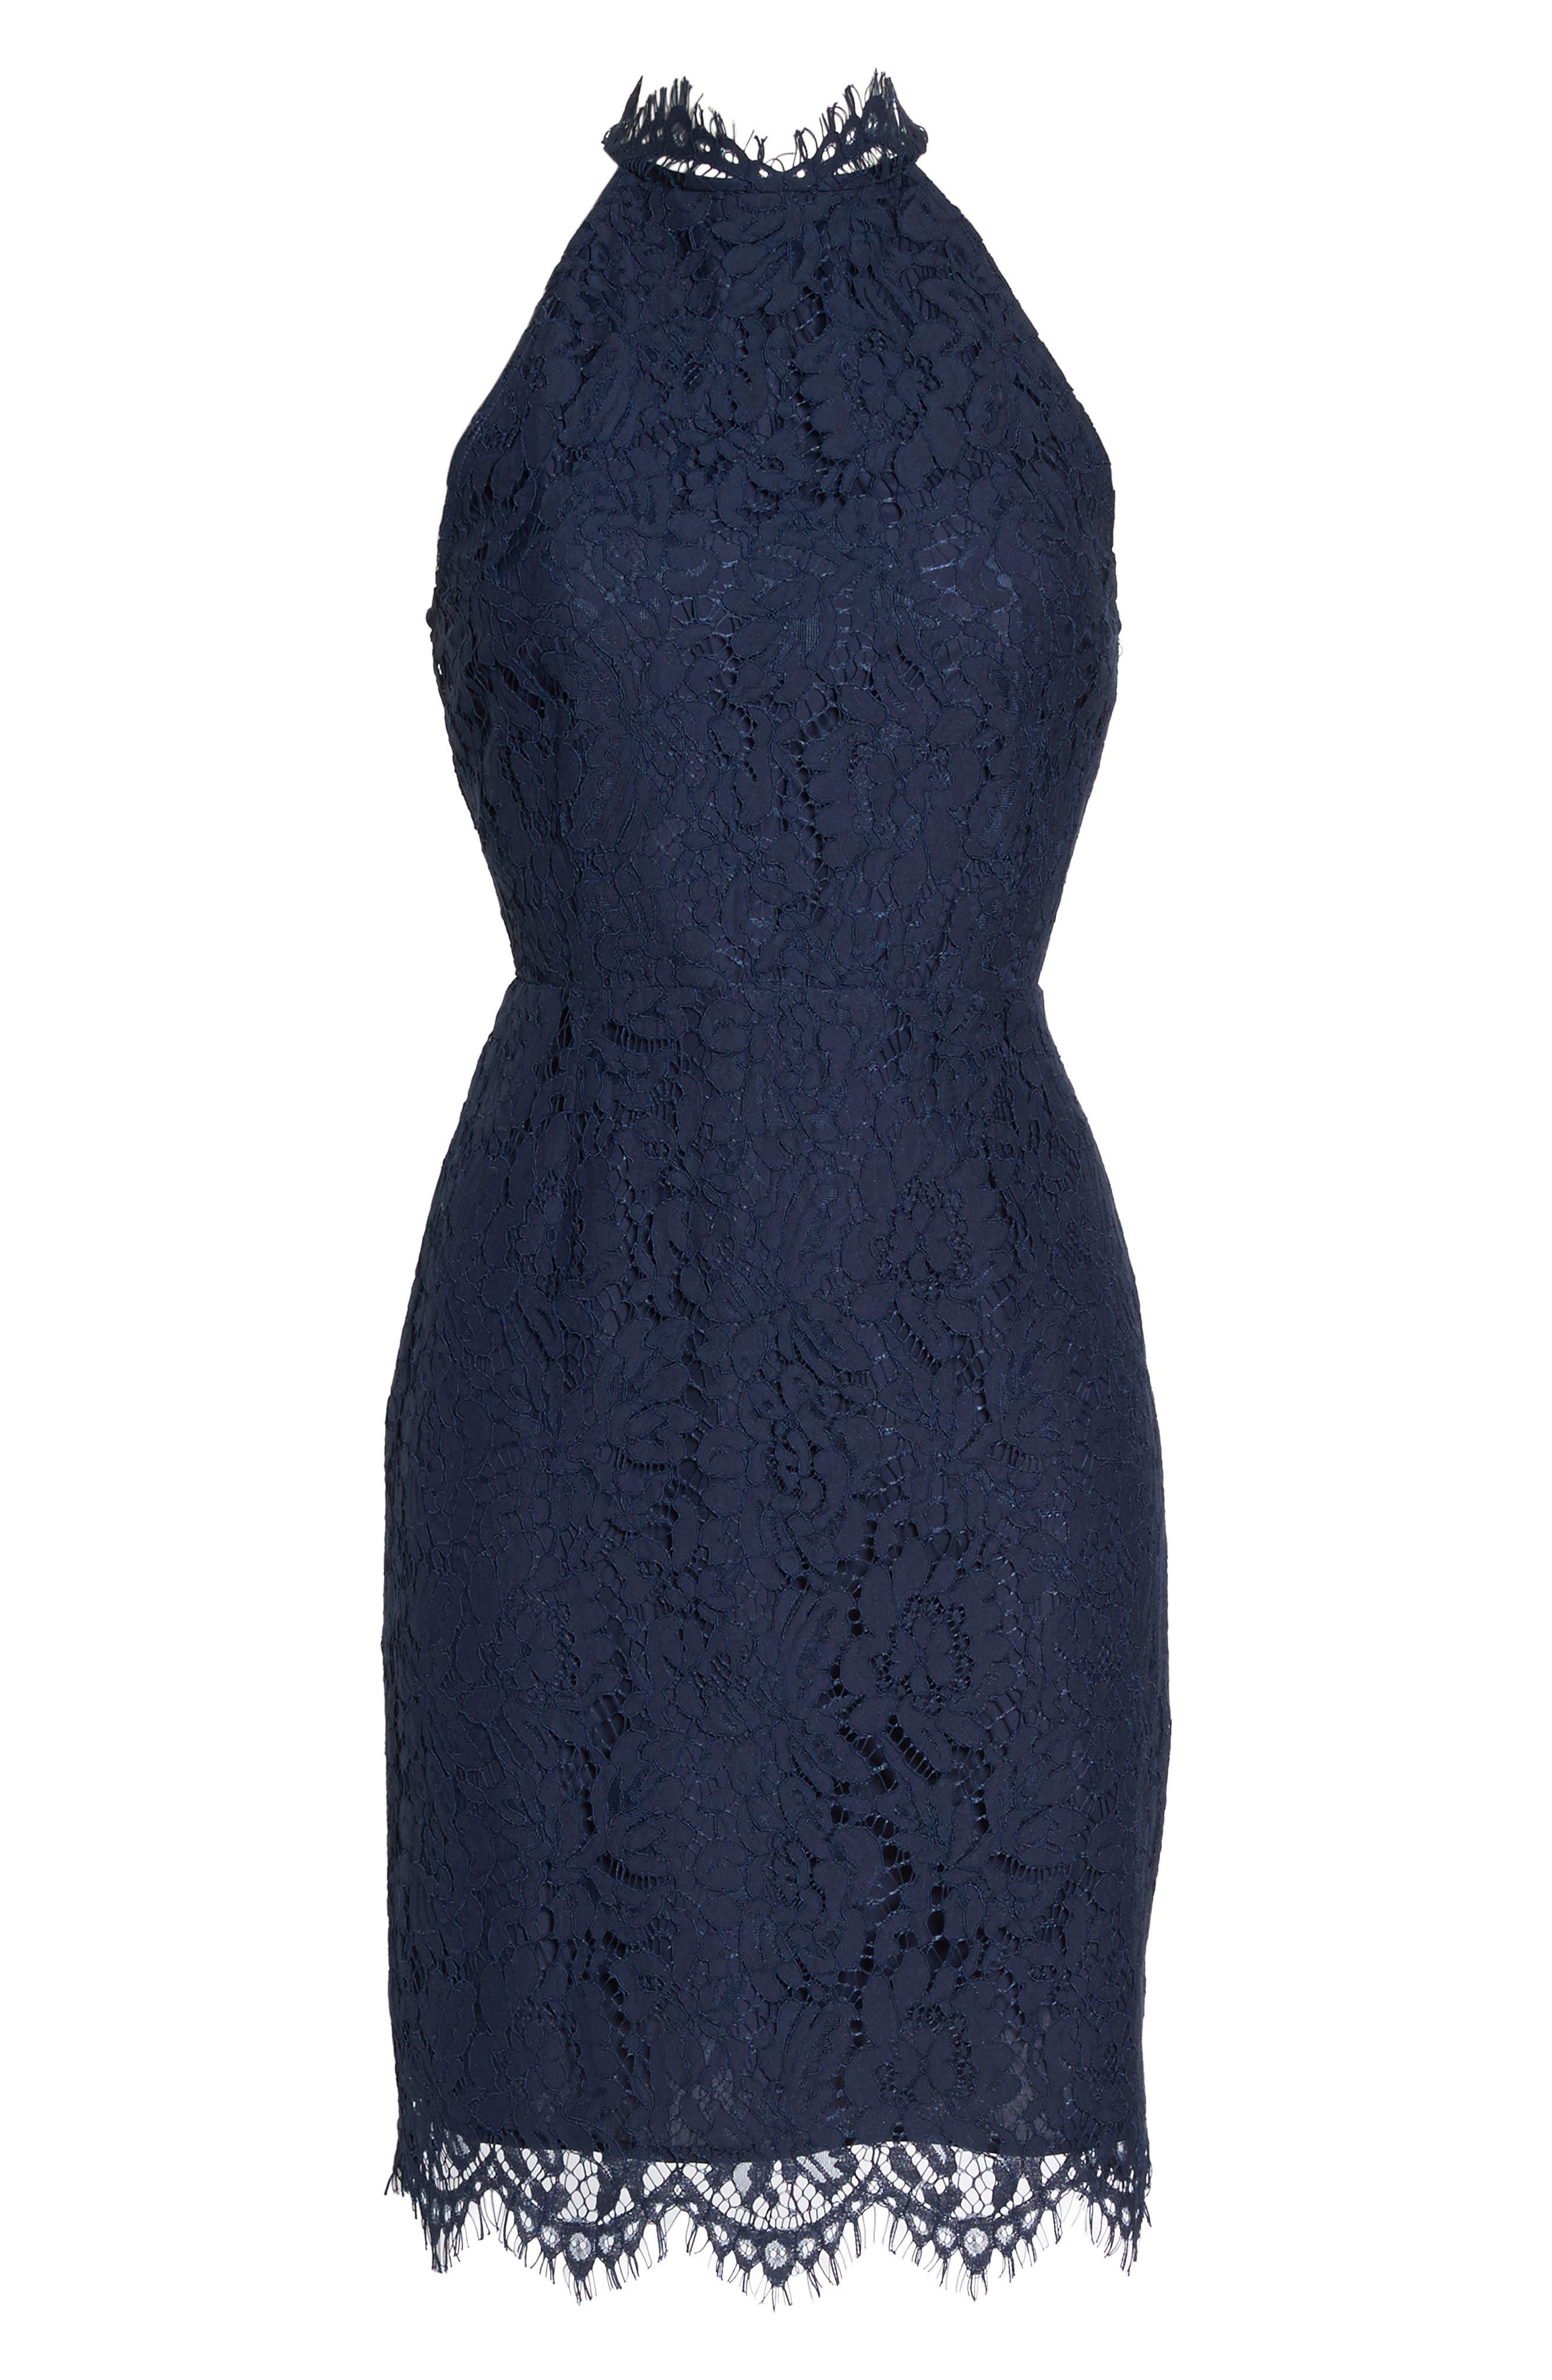 'Cara' High Neck Lace Dress,                             Alternate thumbnail 7, color,                             NAVY